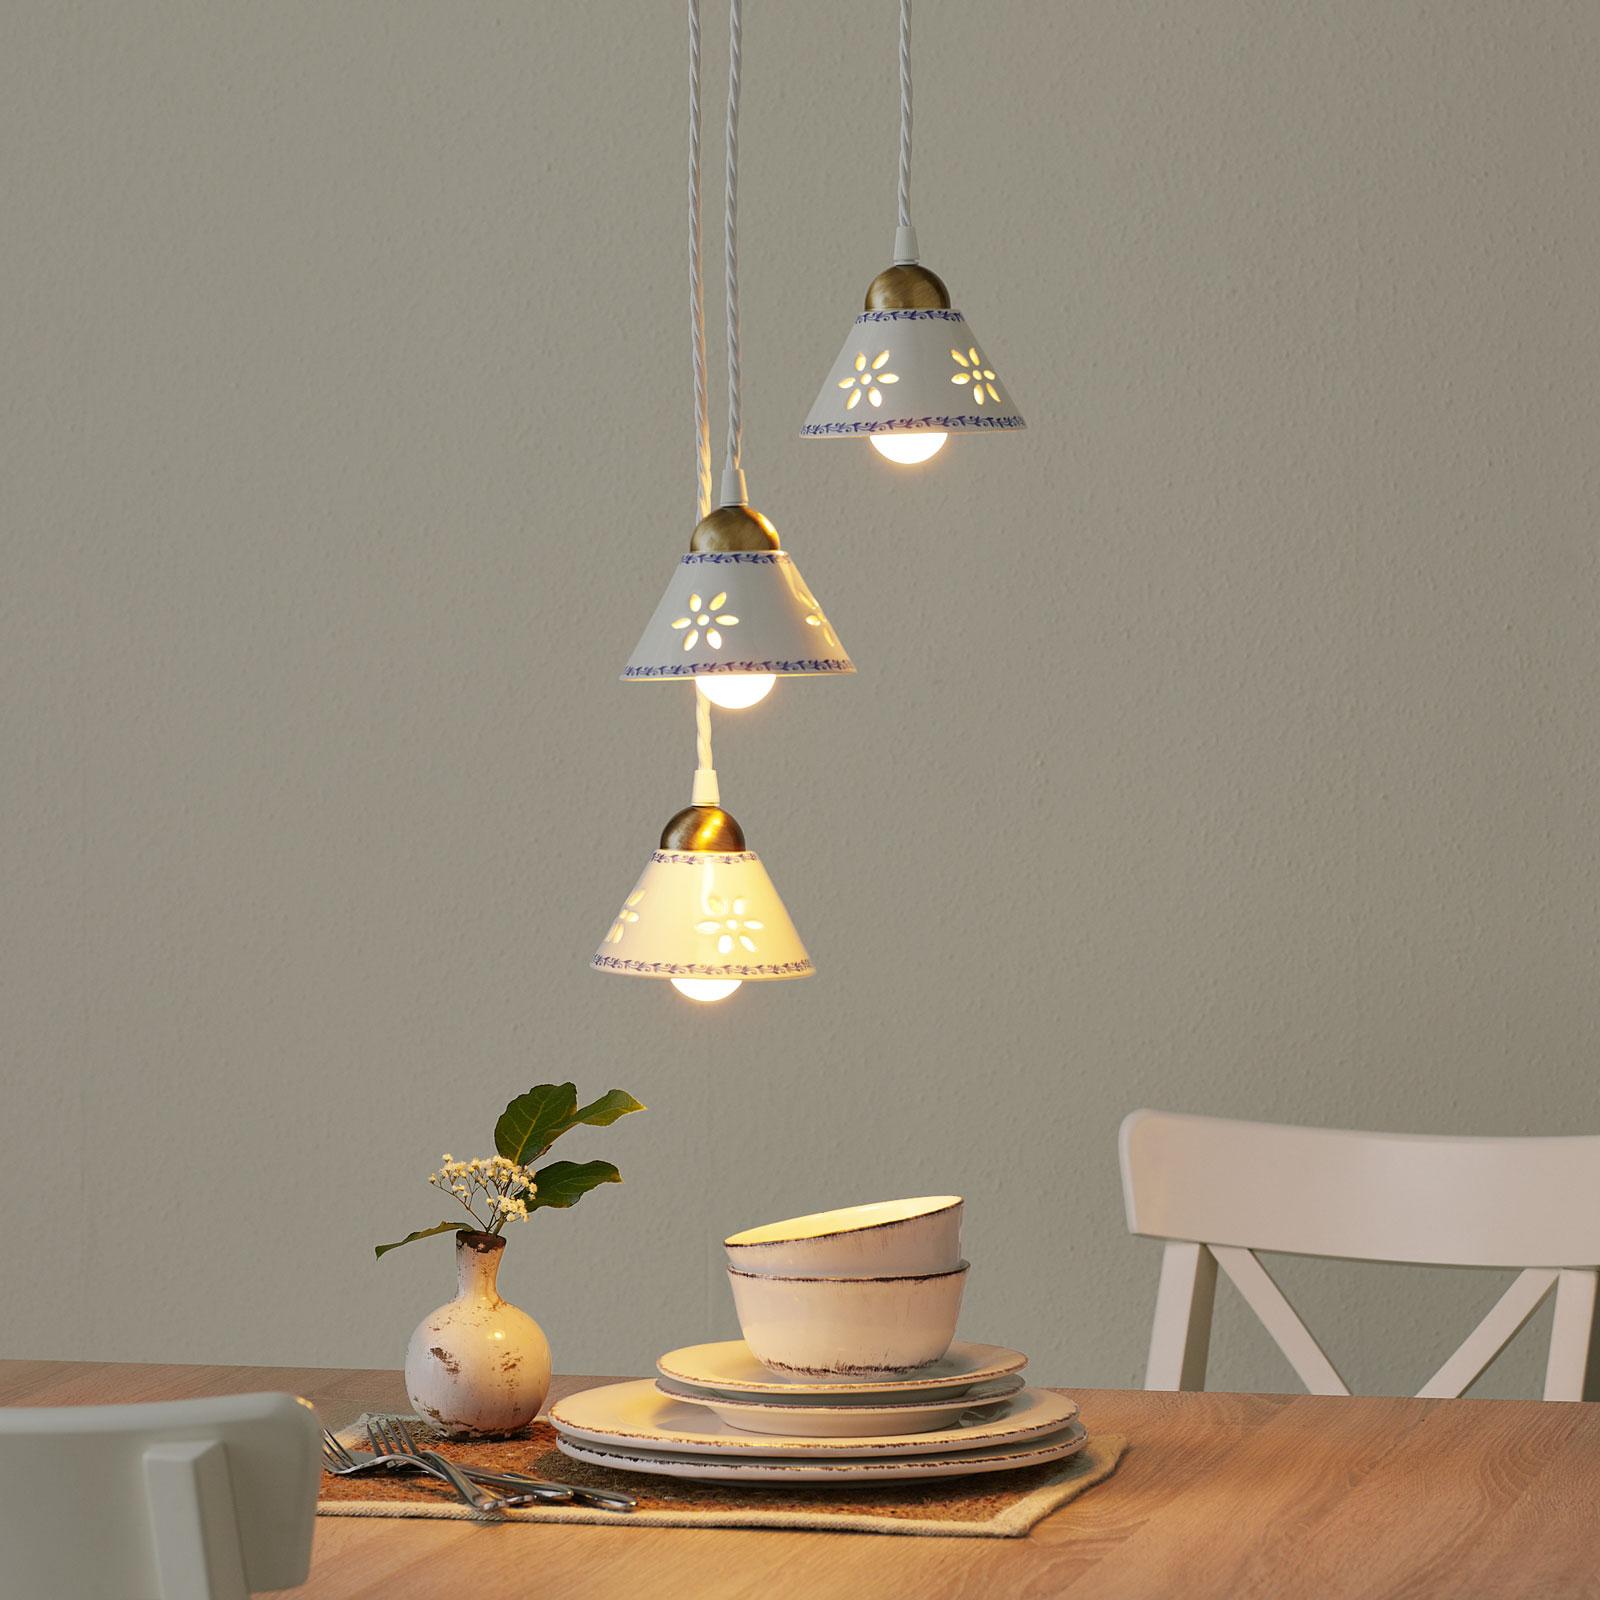 Lámpara colgante de cerámica blanca Nonna, 3 luces